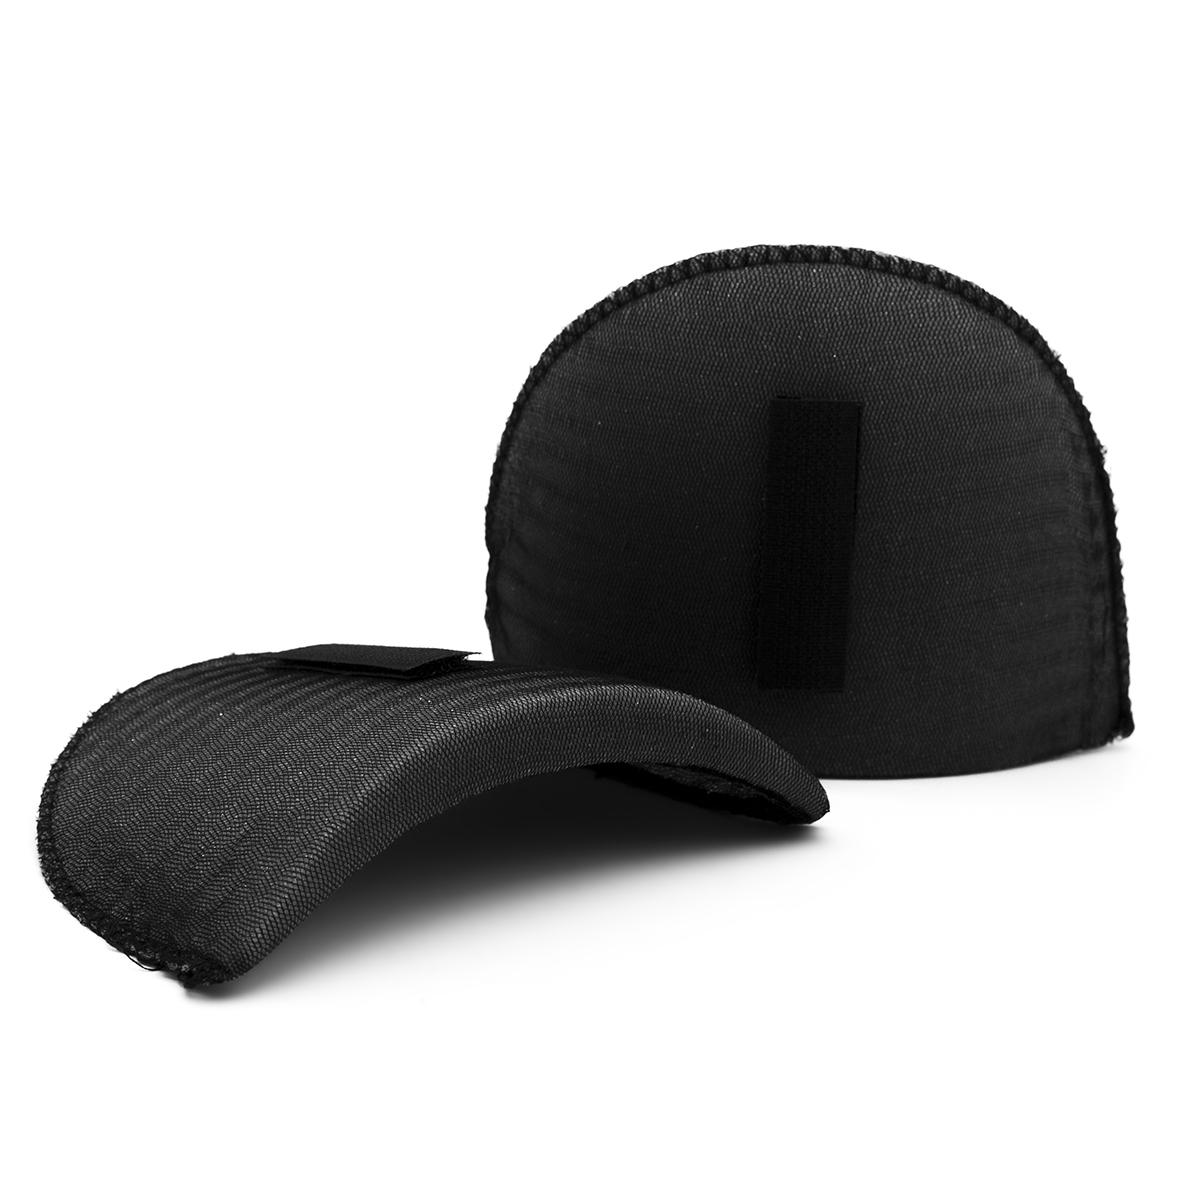 ВК-14/А Плечевые накладки втачные обшитые с конт.-лентой, 14*100*150мм Hobby&Pro